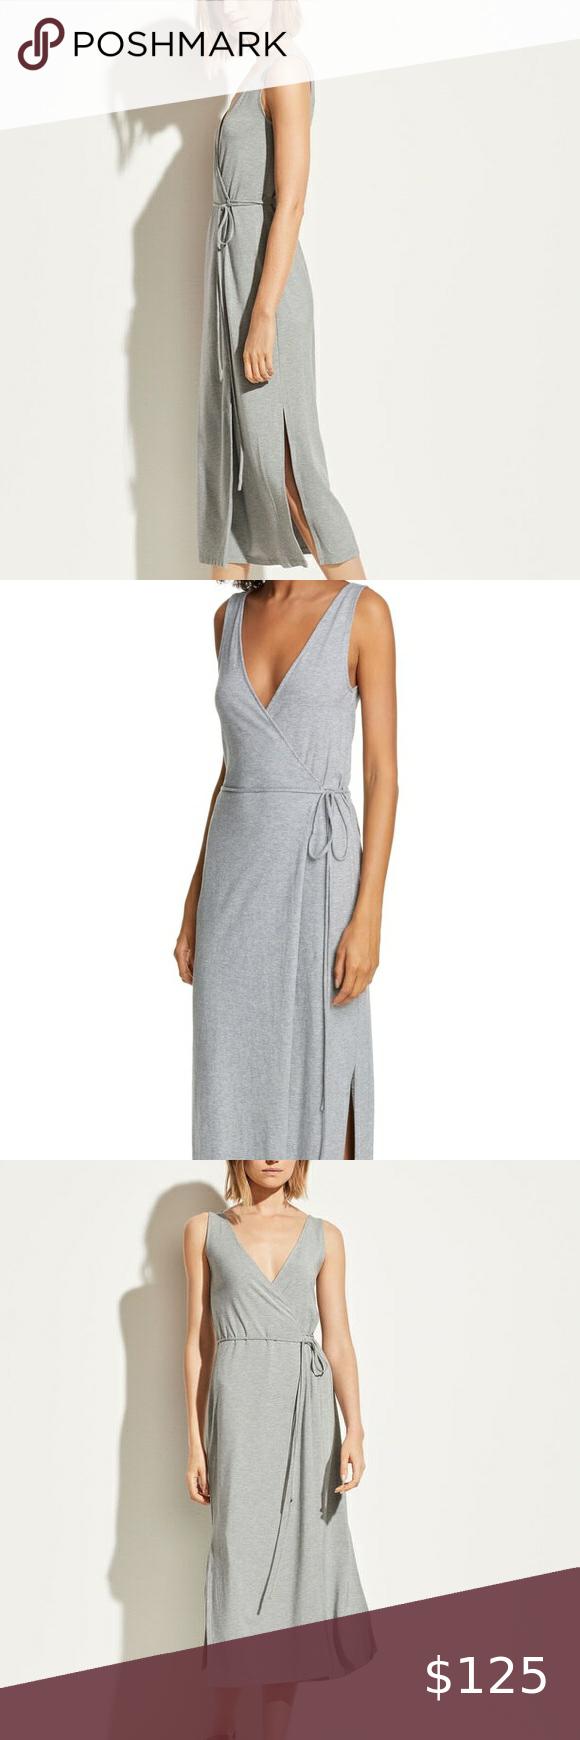 Nwt Vince V Neck Midi Wrap Dress Size Medium Wrap Dress Vince Dress Dresses [ 1740 x 580 Pixel ]